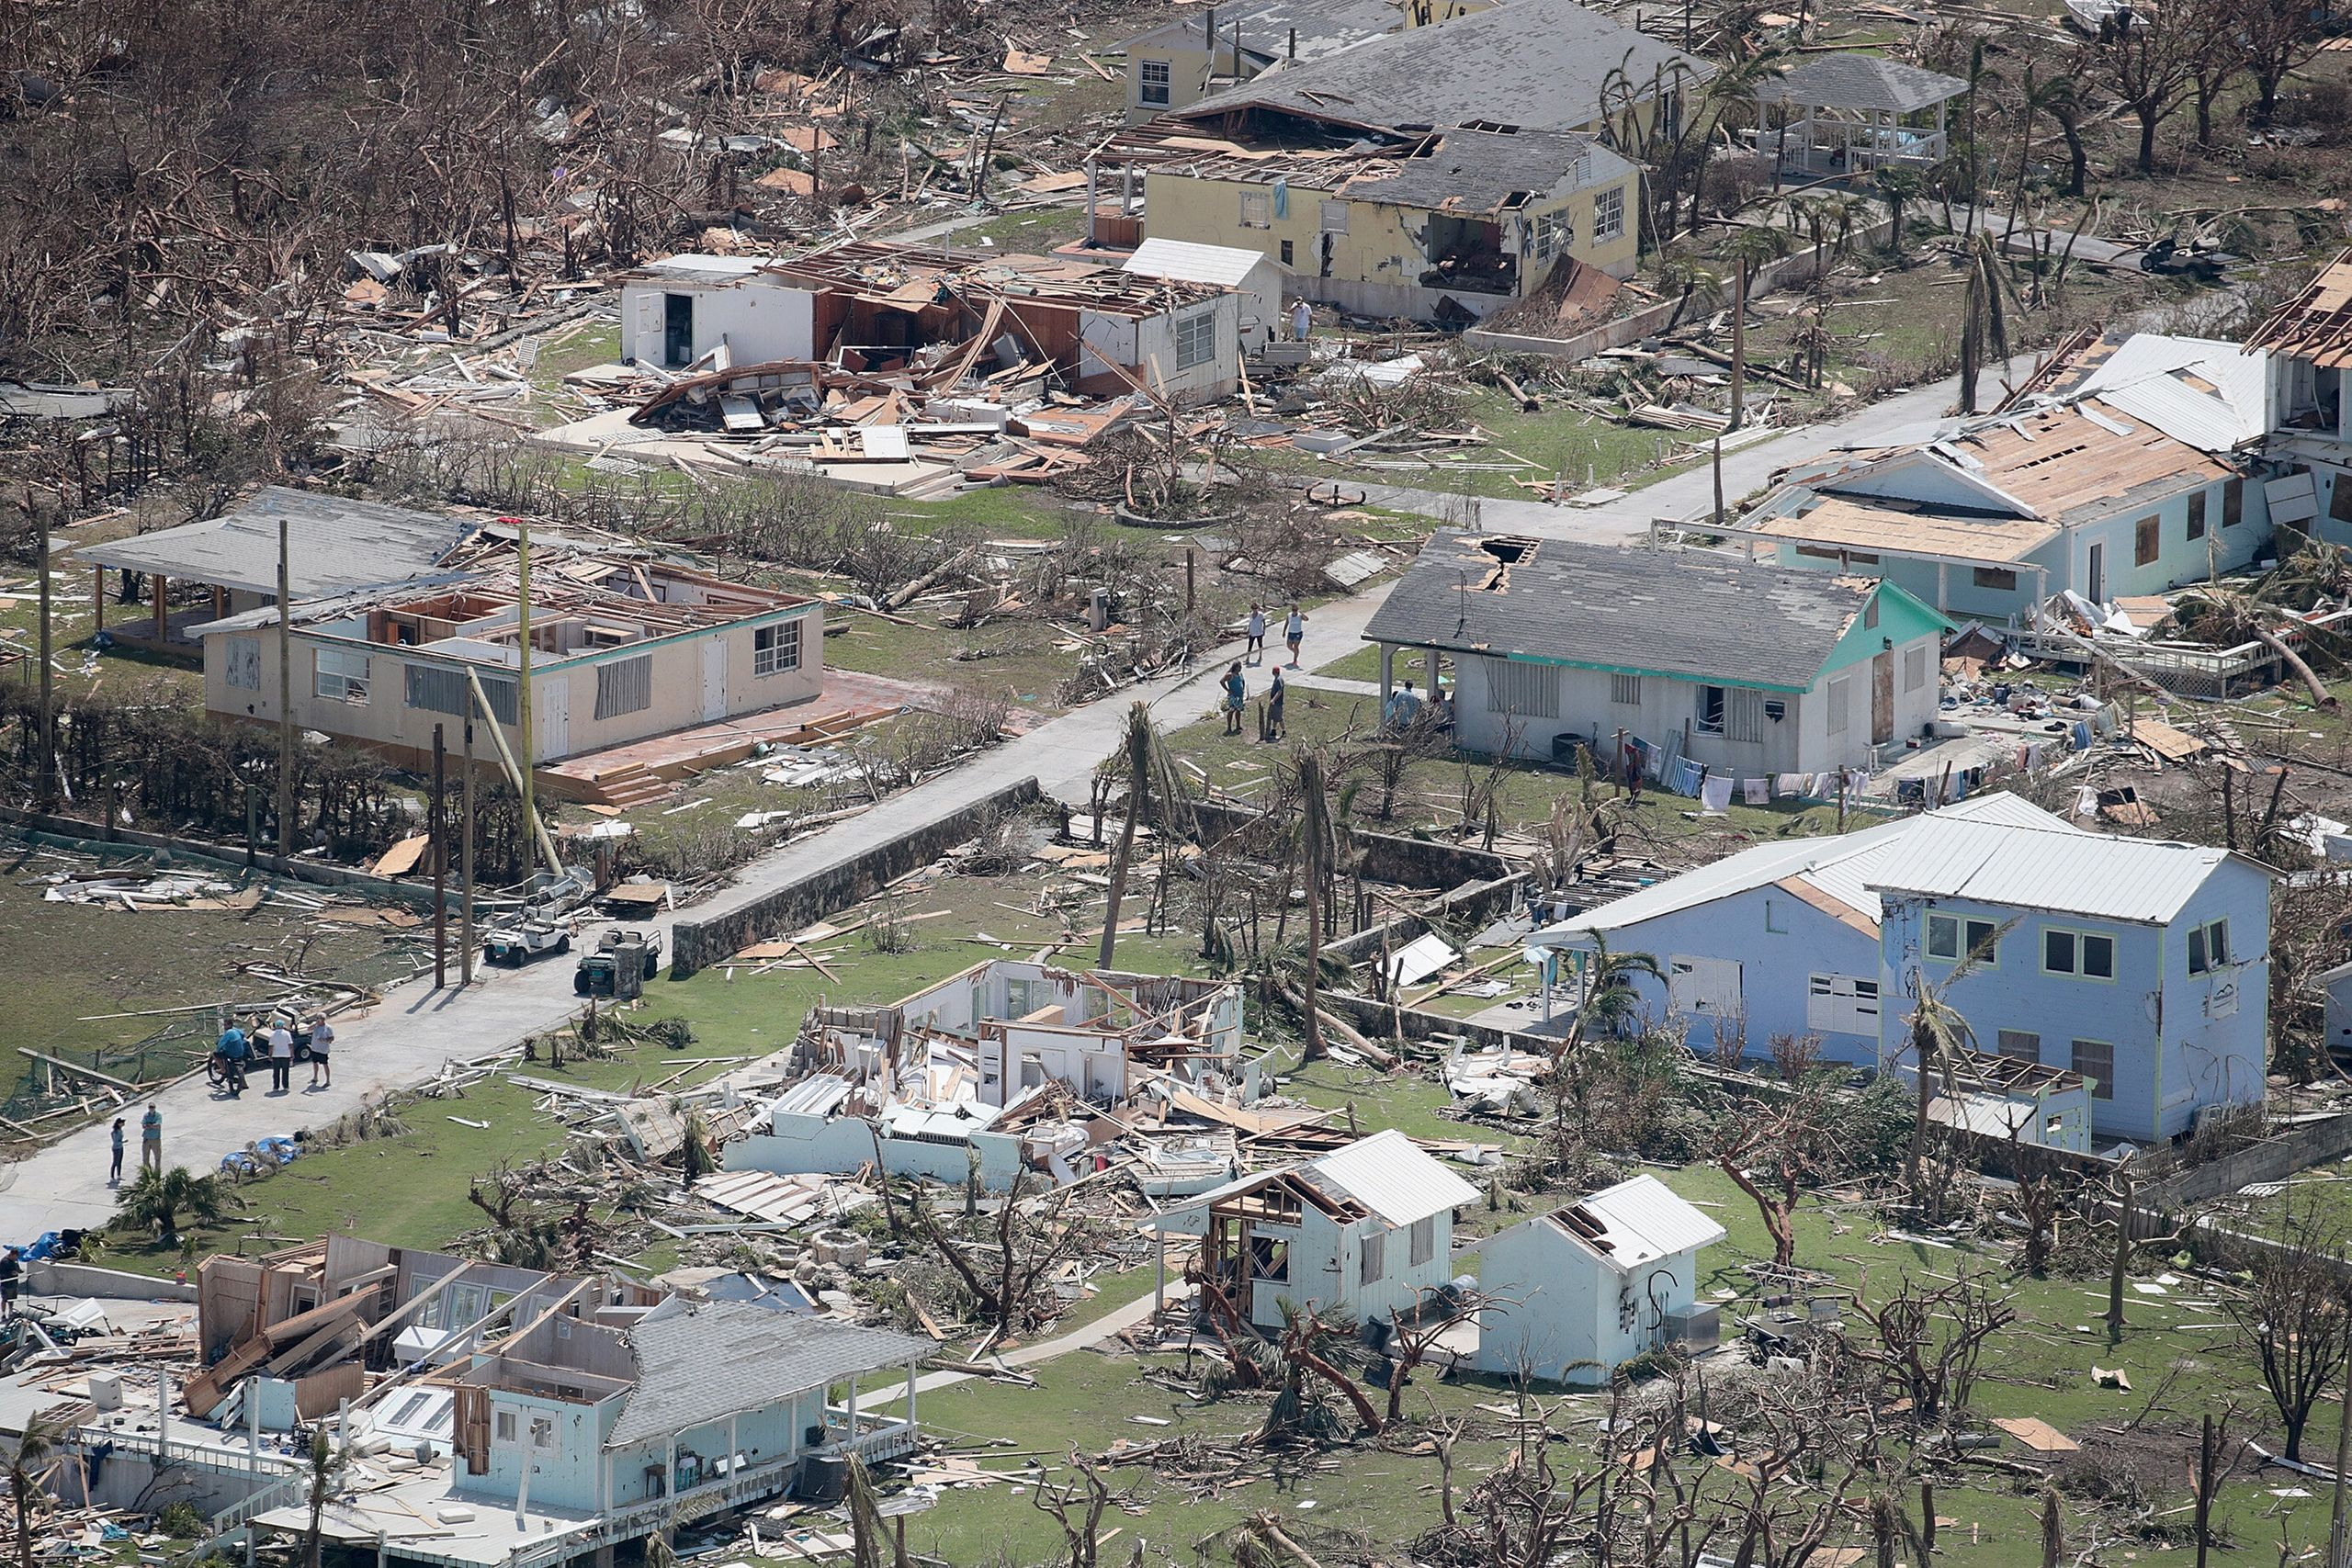 Westlake Legal Group 5d715eba2500007a12054012 Dramatic Images Show Hurricane Dorian Destruction From Above